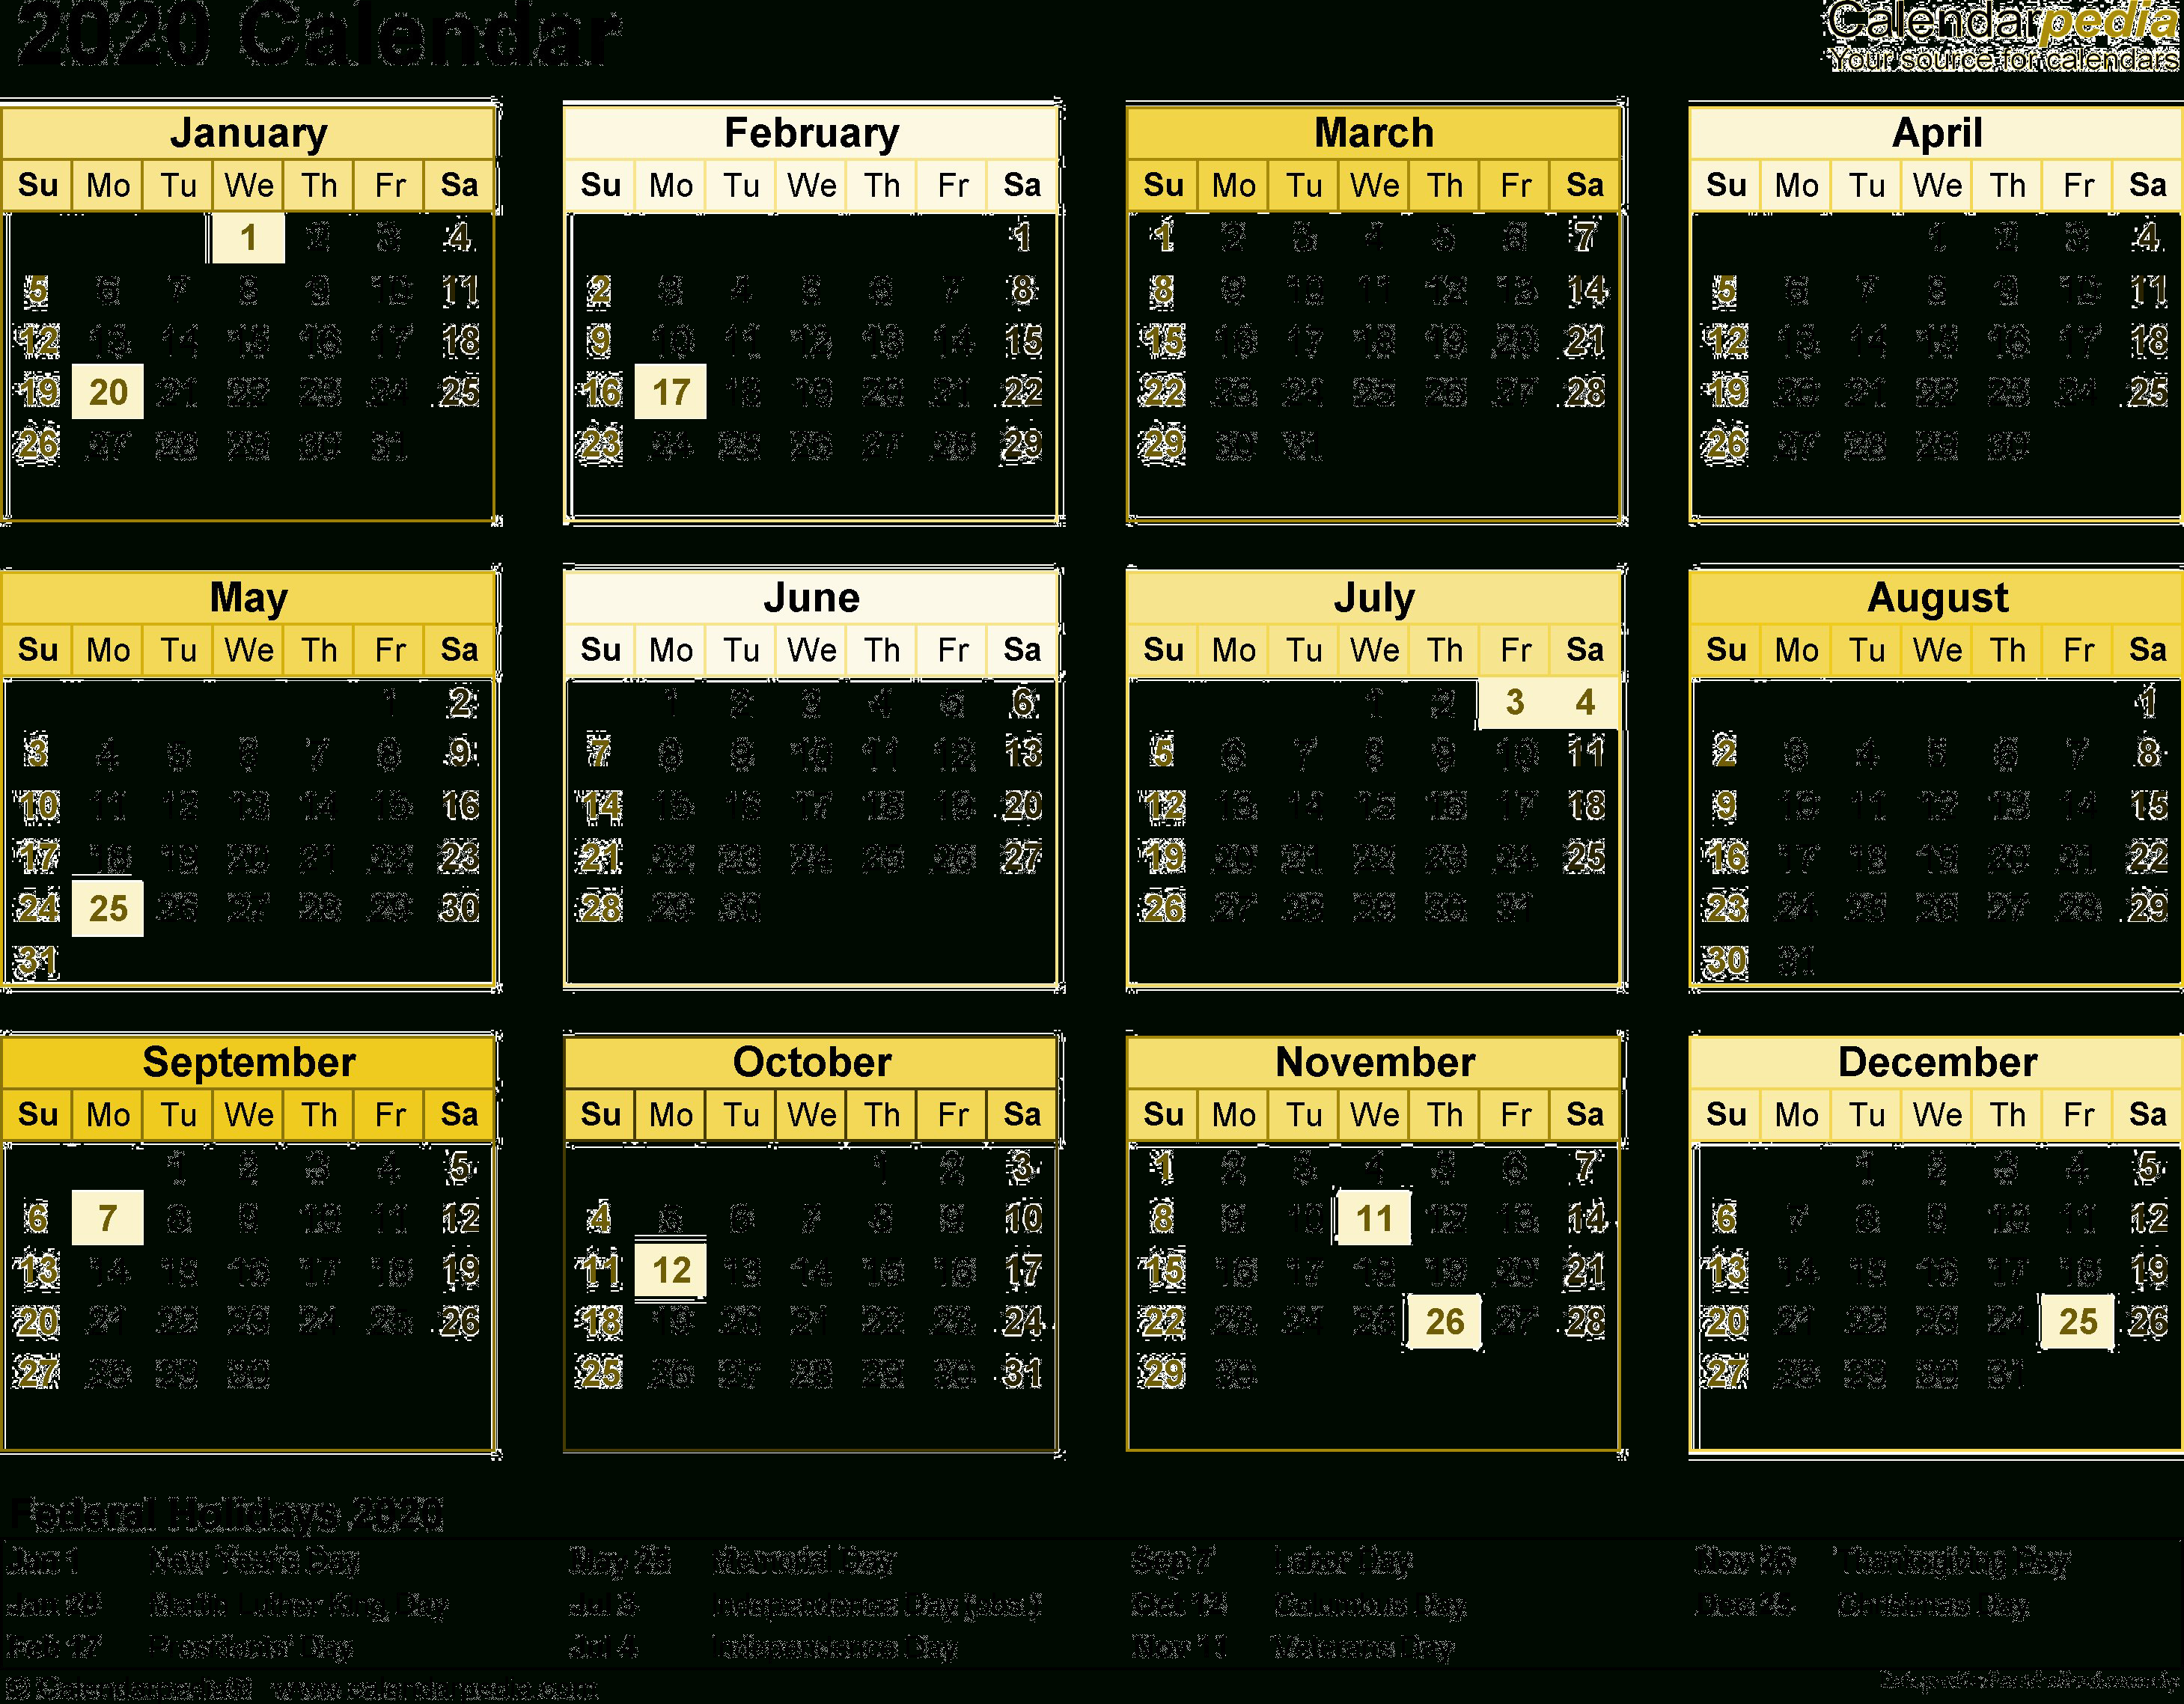 2020 Calendar Png Transparent Images | Png All